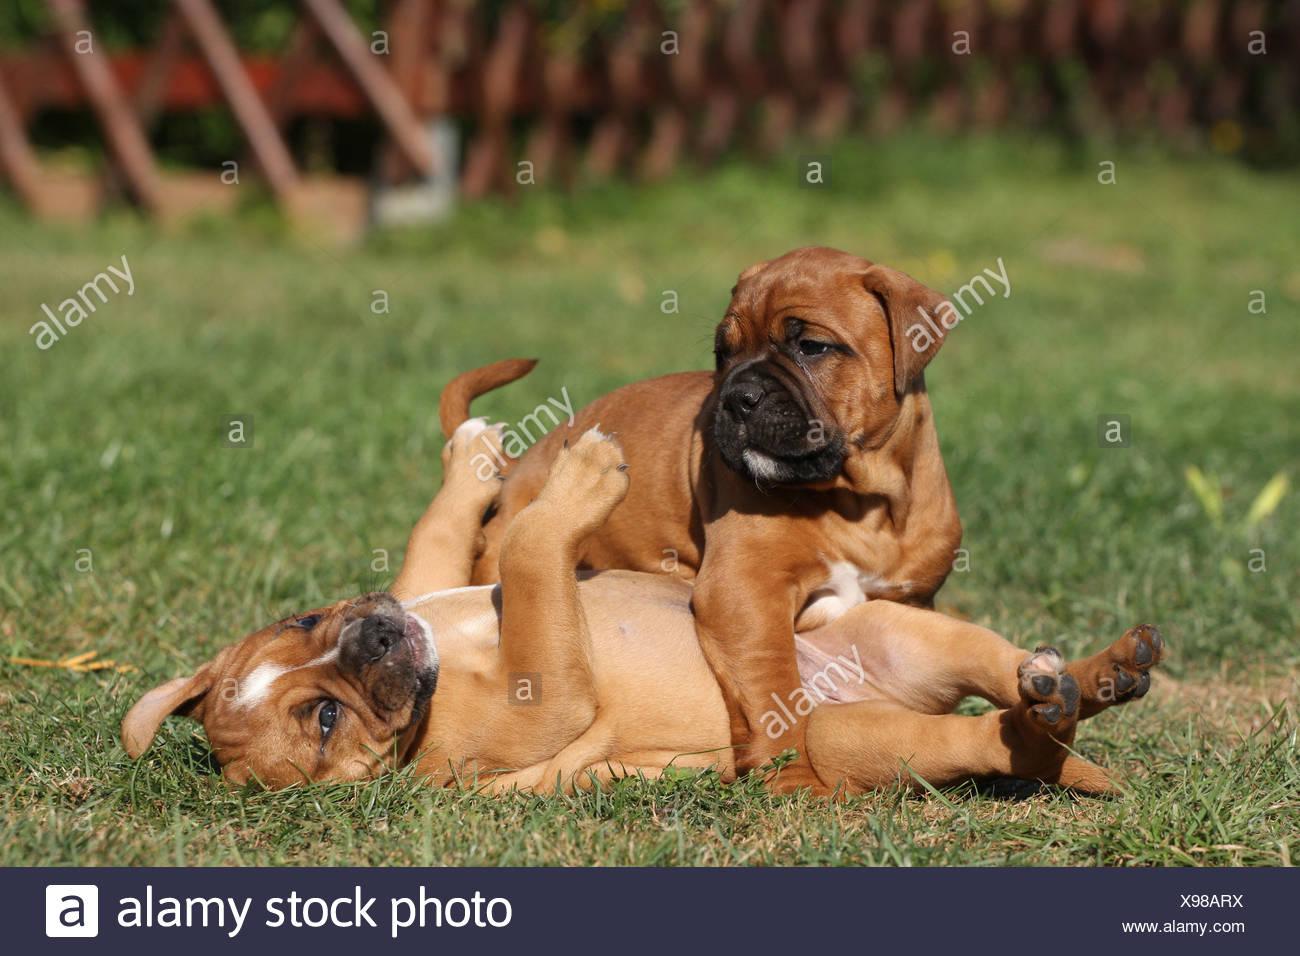 Olde English Bulldogs - Stock Image